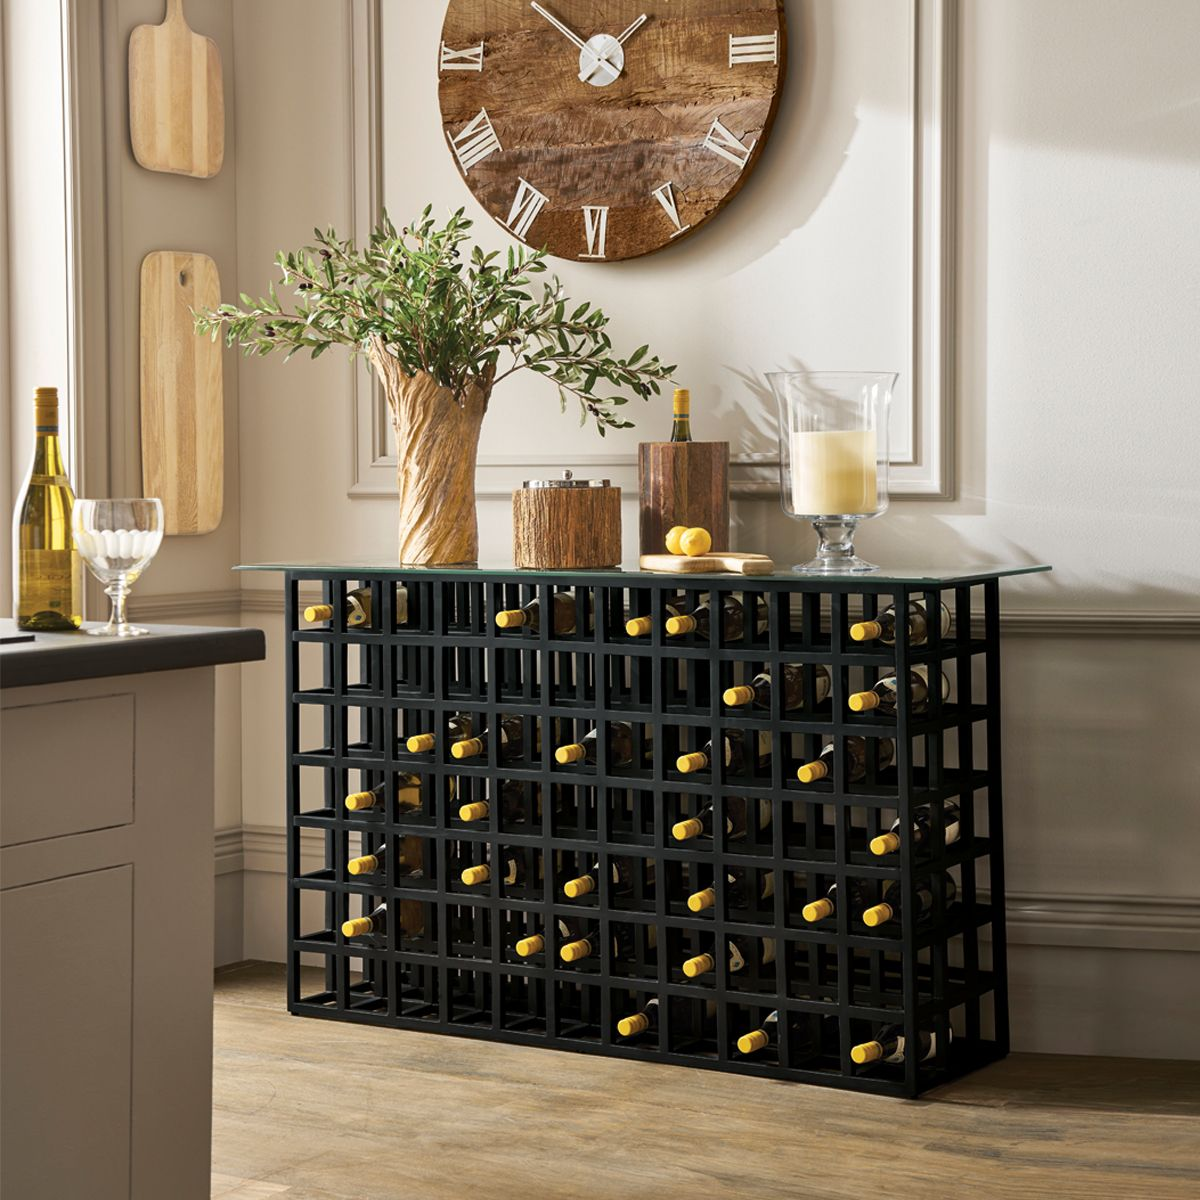 Large Cricova Wine Rack Console Table Black Wine Rack Design Modern Wine Rack Diy Wine Rack